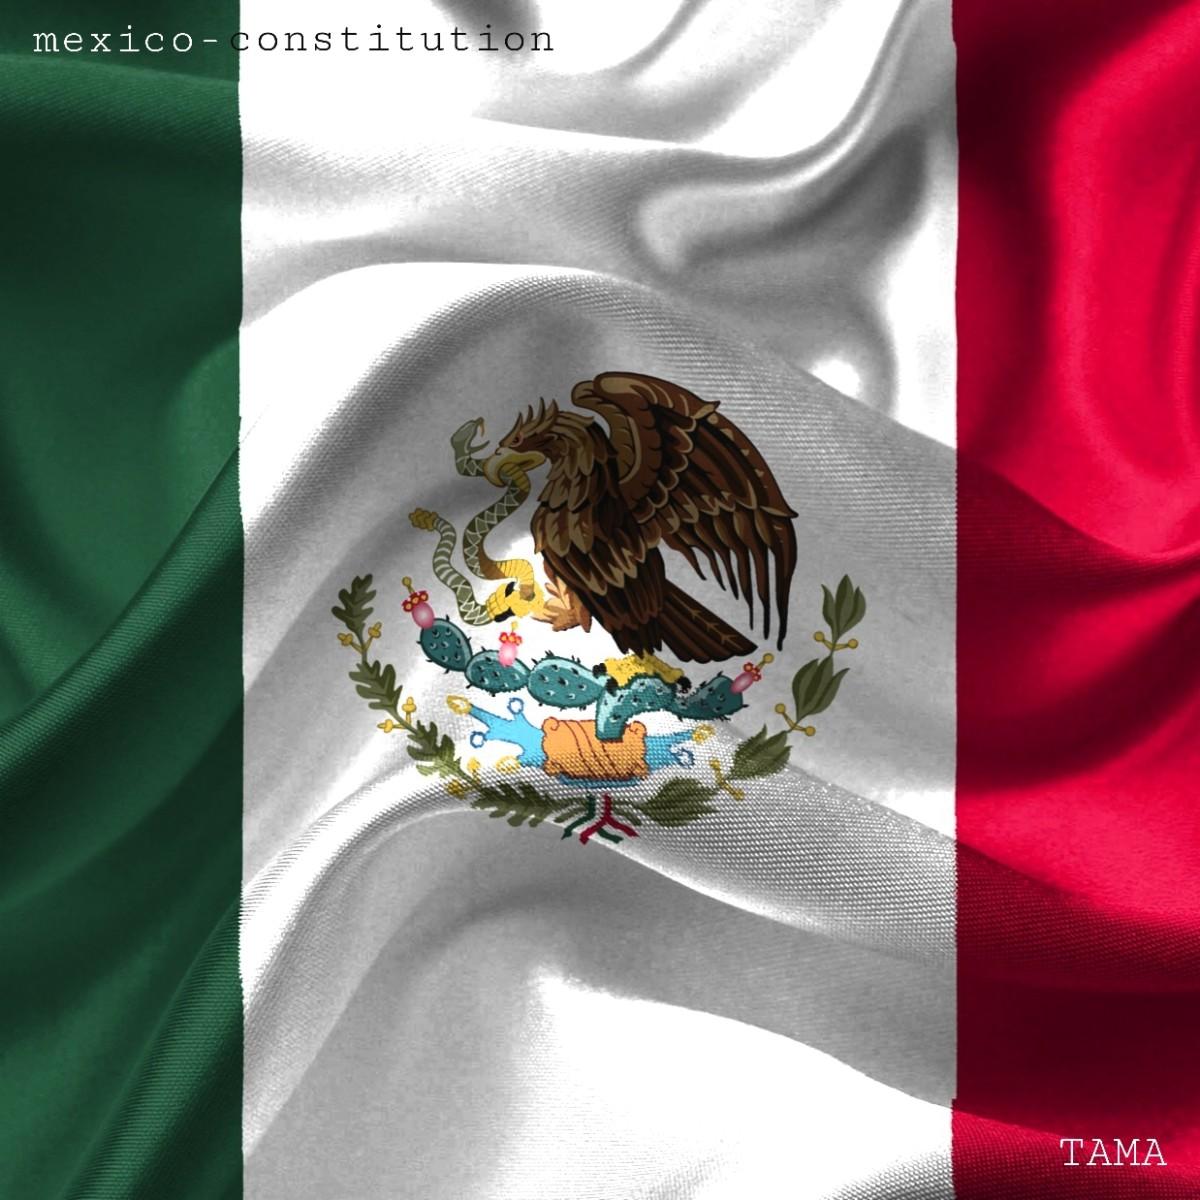 constitution of mexico